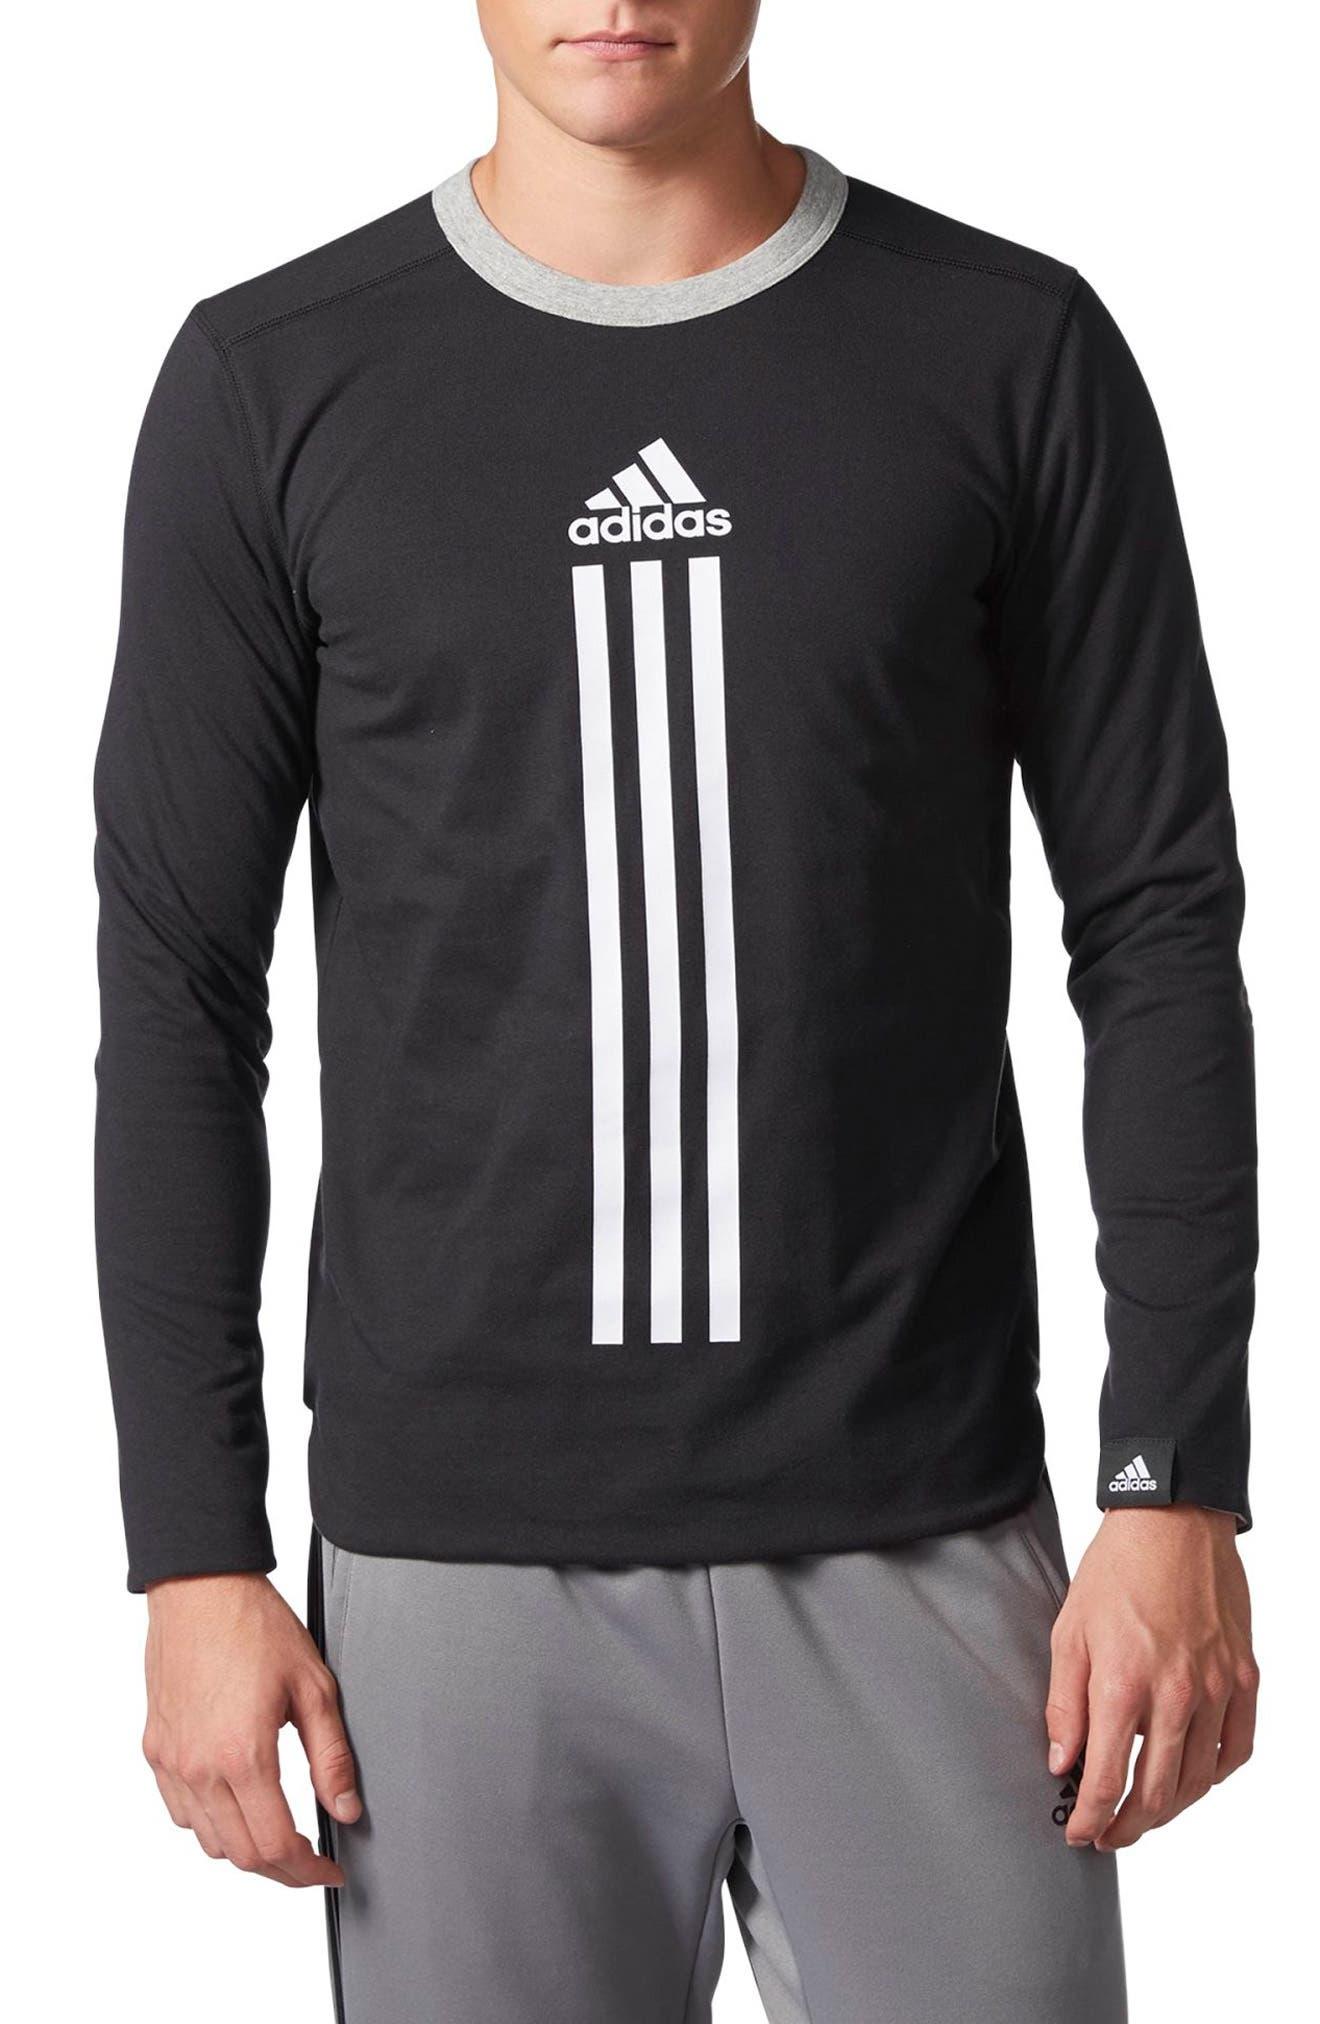 ID Long Sleeve Performance T-Shirt,                         Main,                         color, Black/ Medium Grey Heather